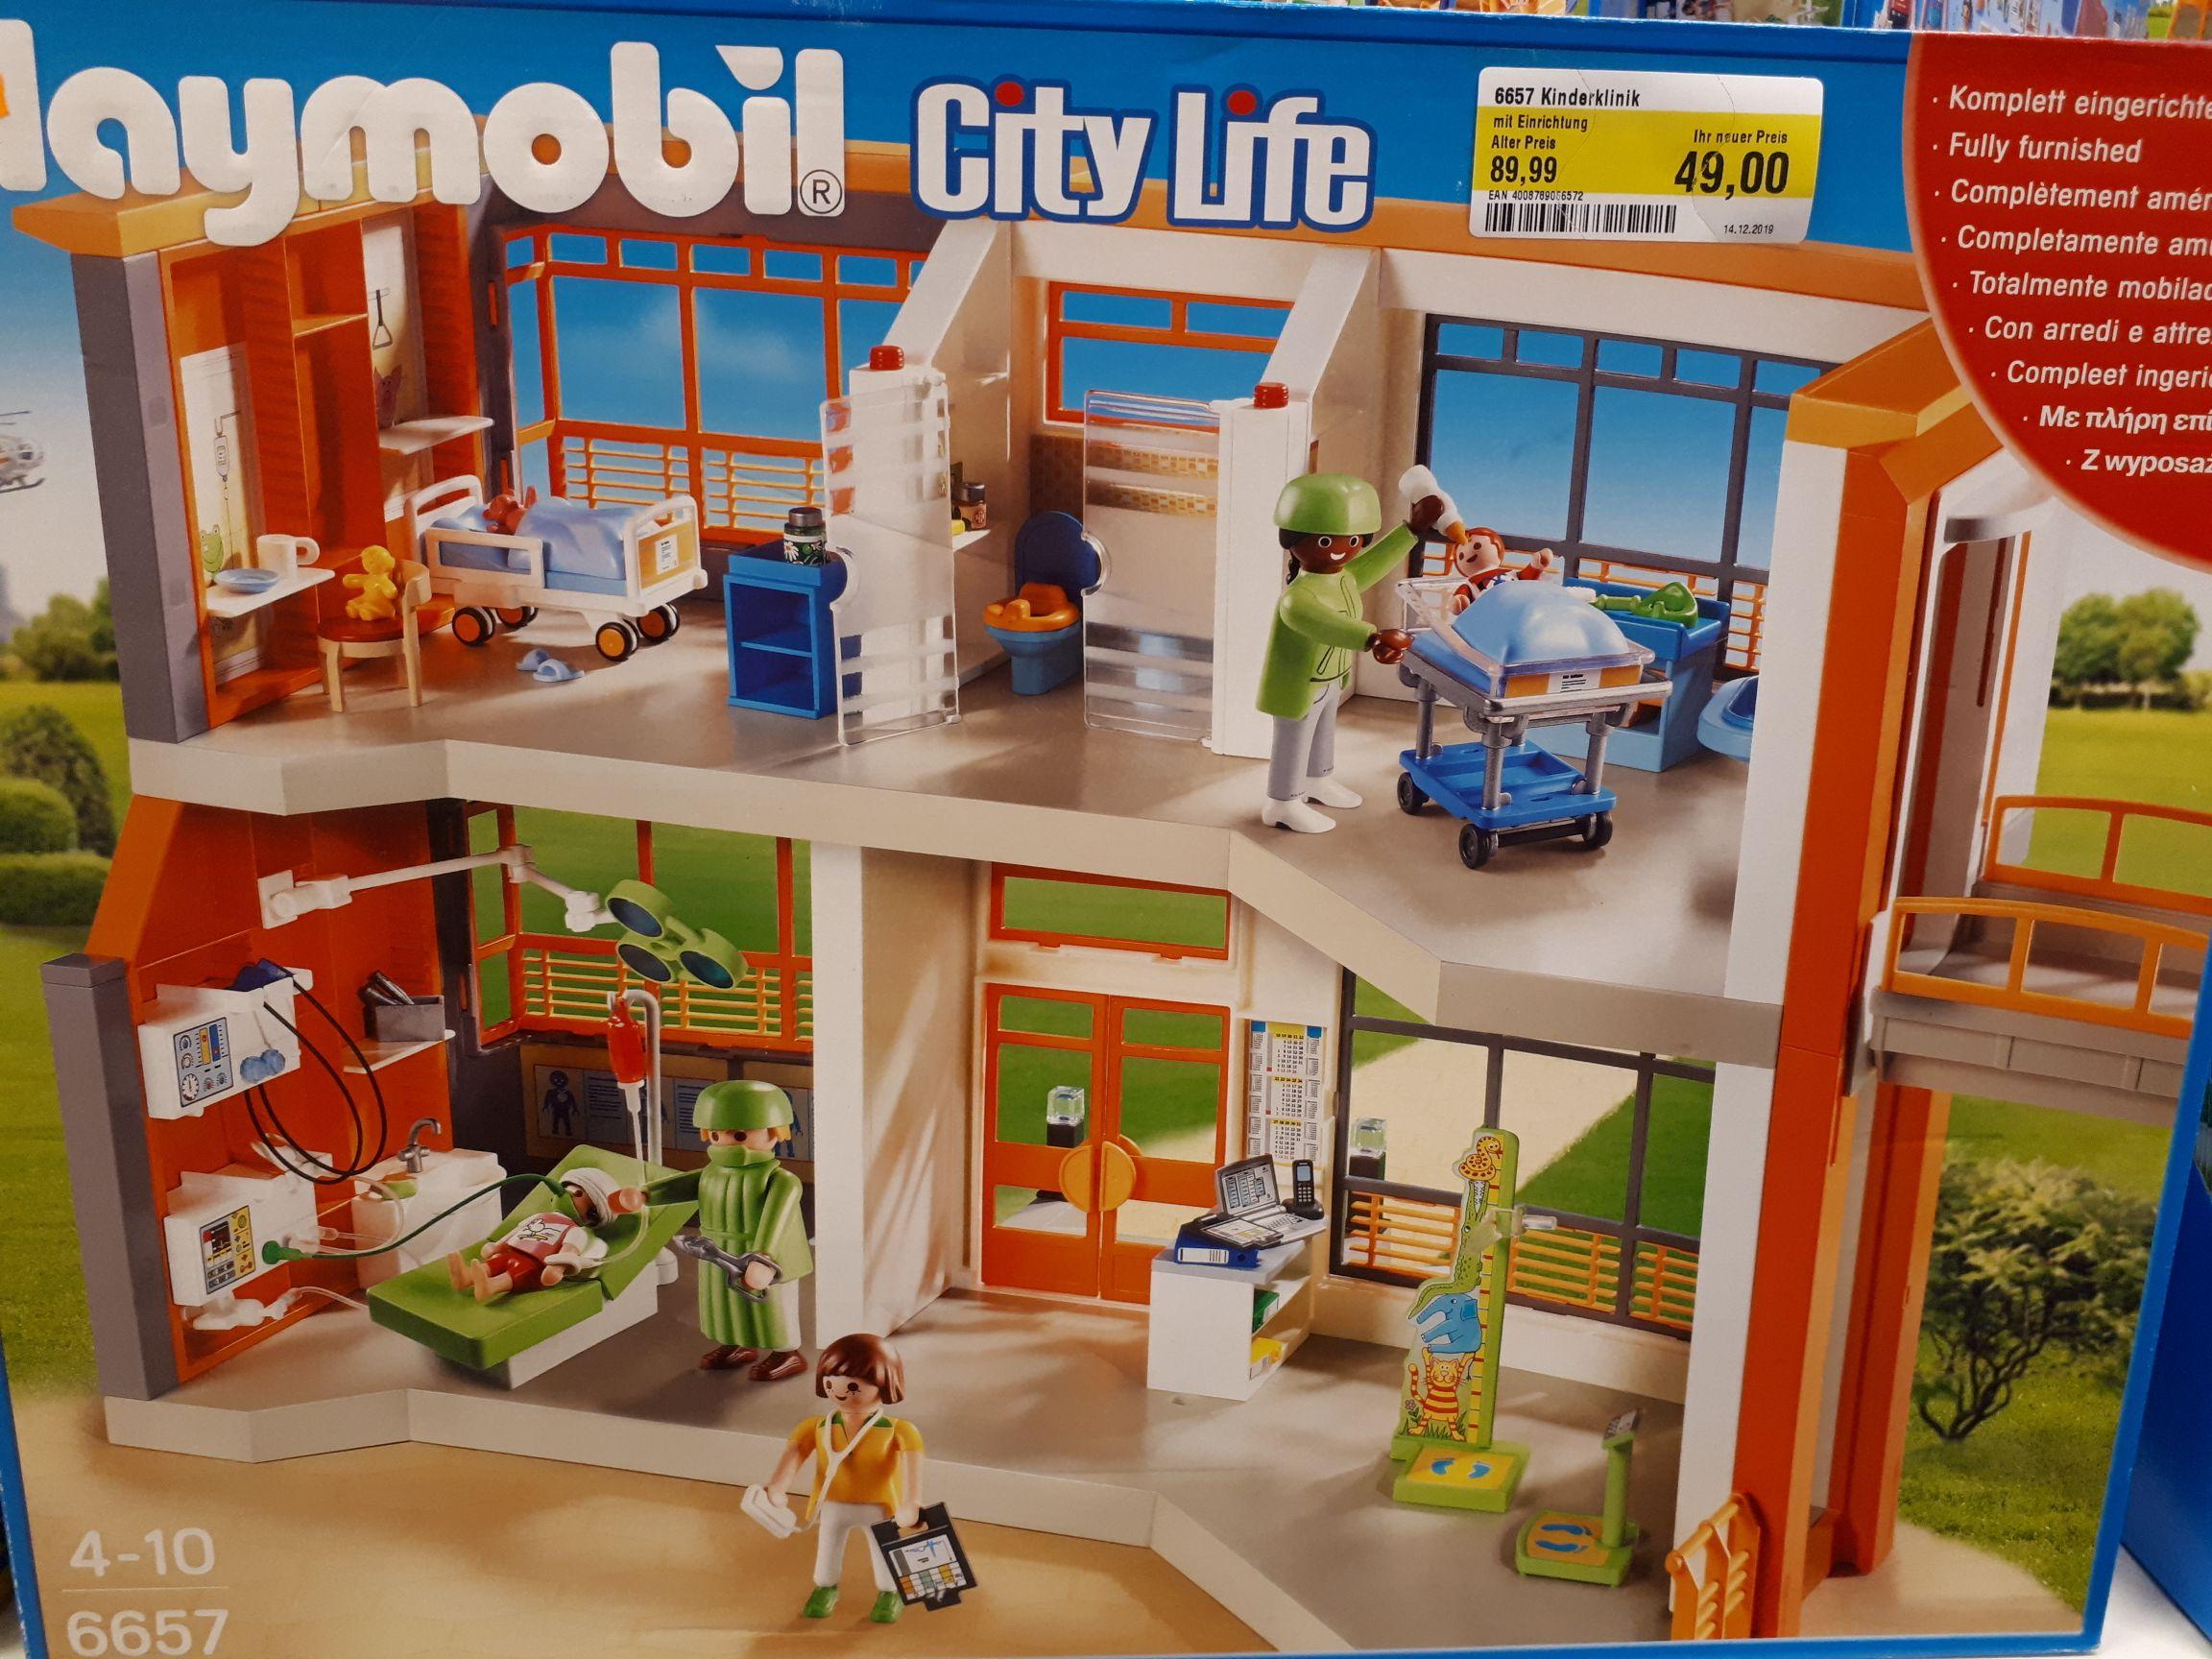 Playmobil Citylife 6657 - Kinderklinik mit Einrichtung **LOKAL**